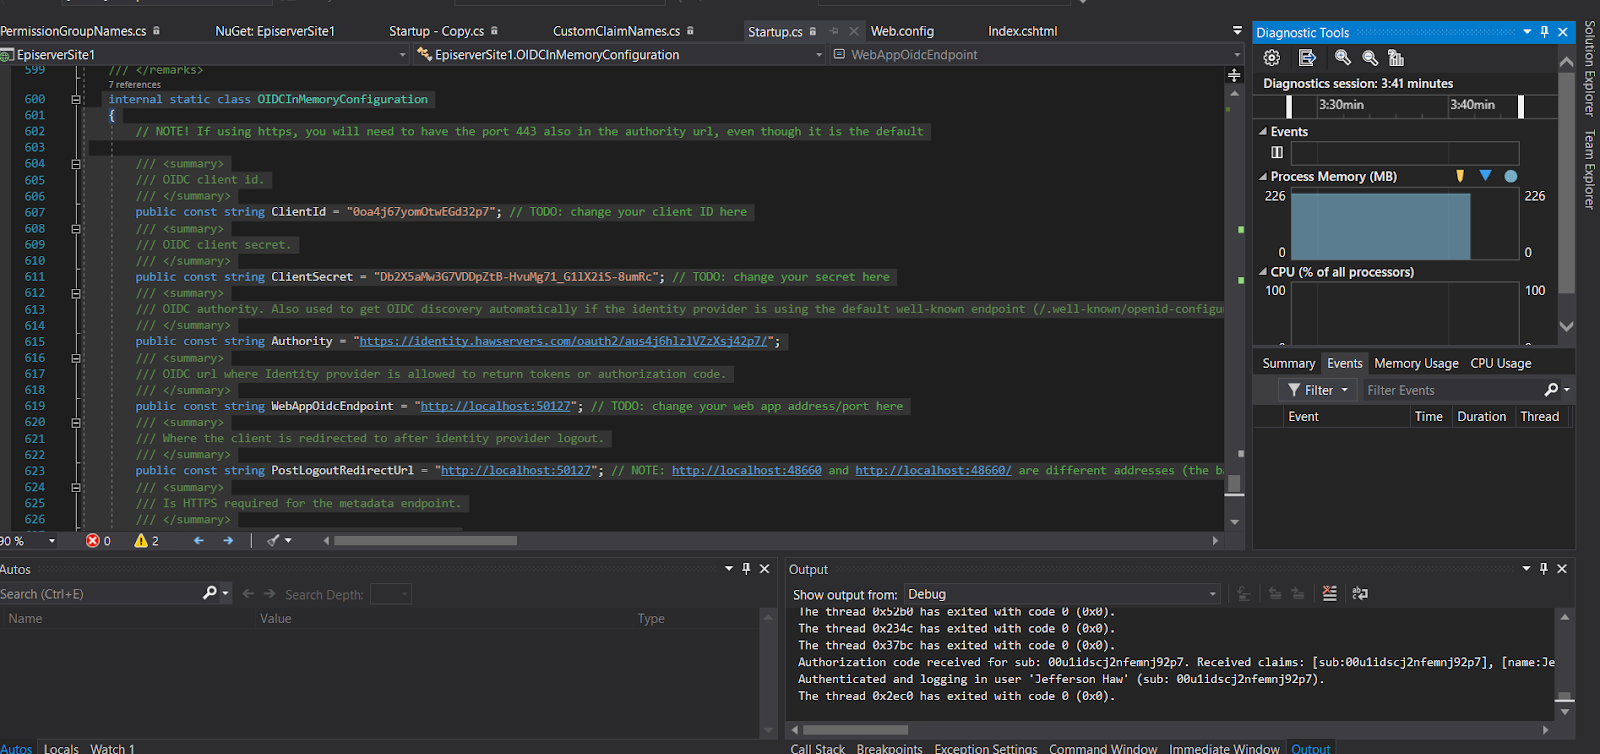 Visual Studio Episerver log output